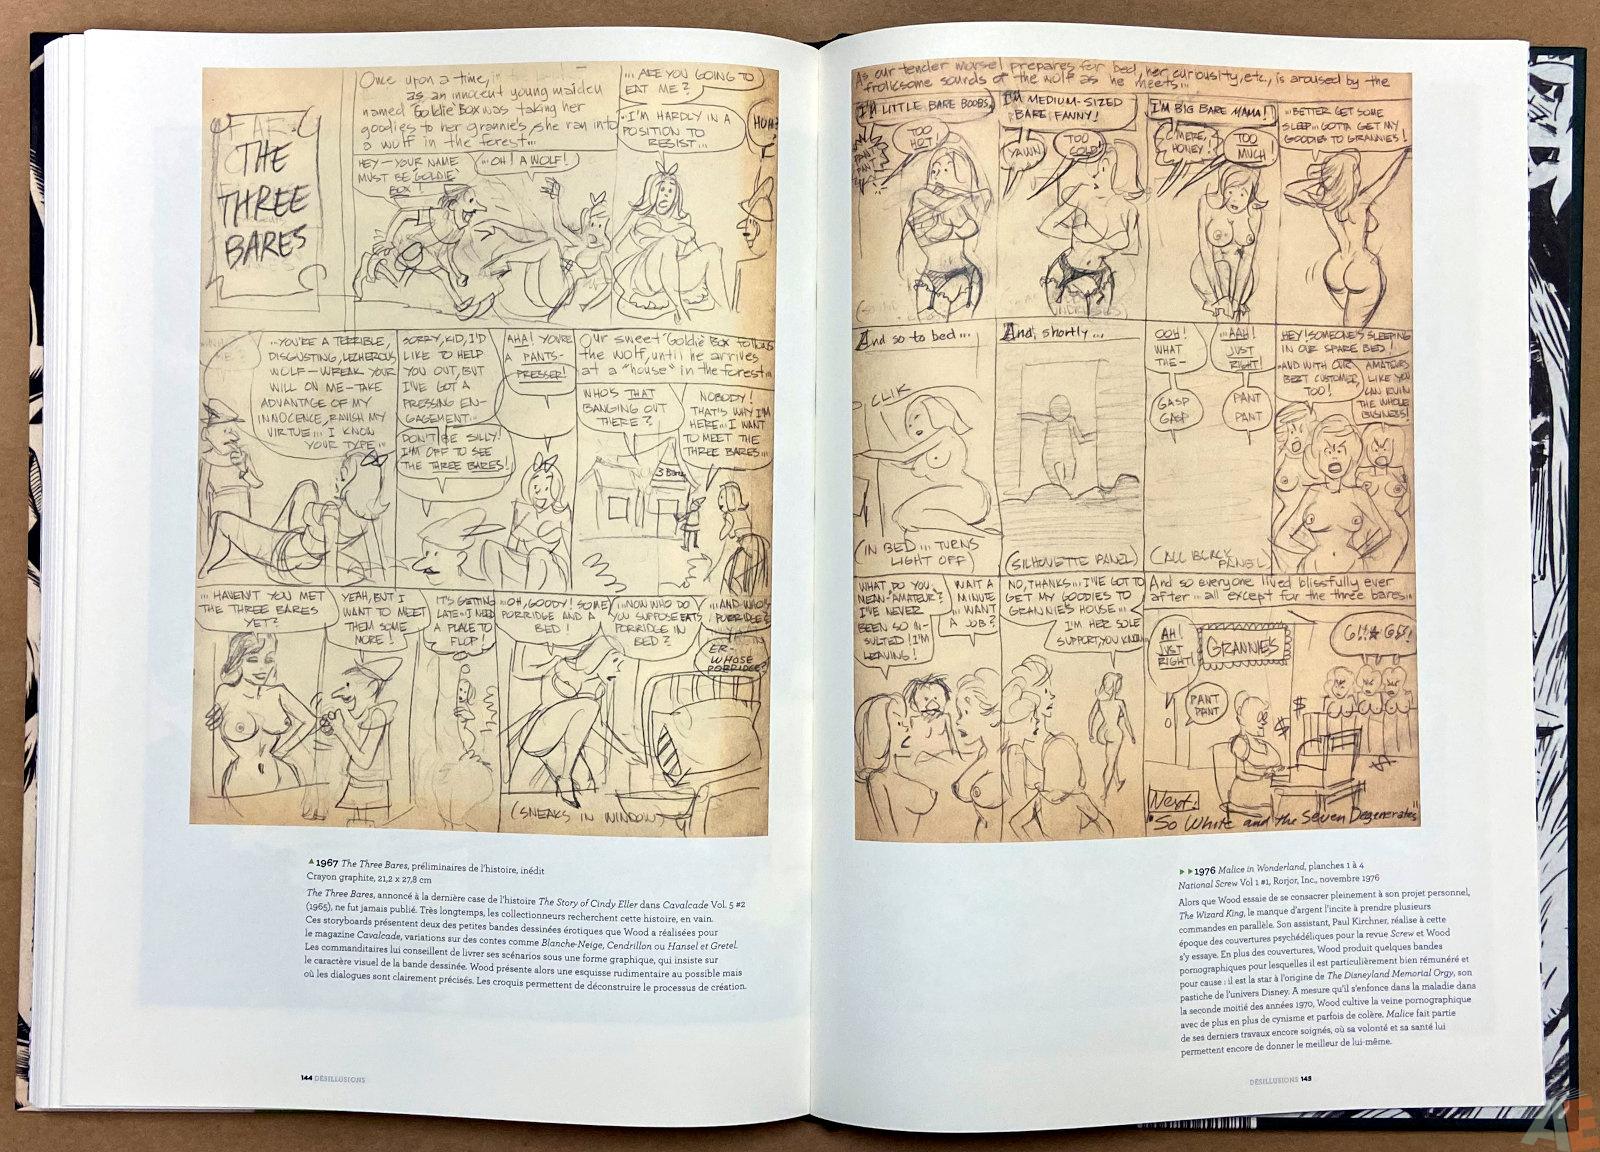 Les Mondes De Wallace Wood catalogue interior 17